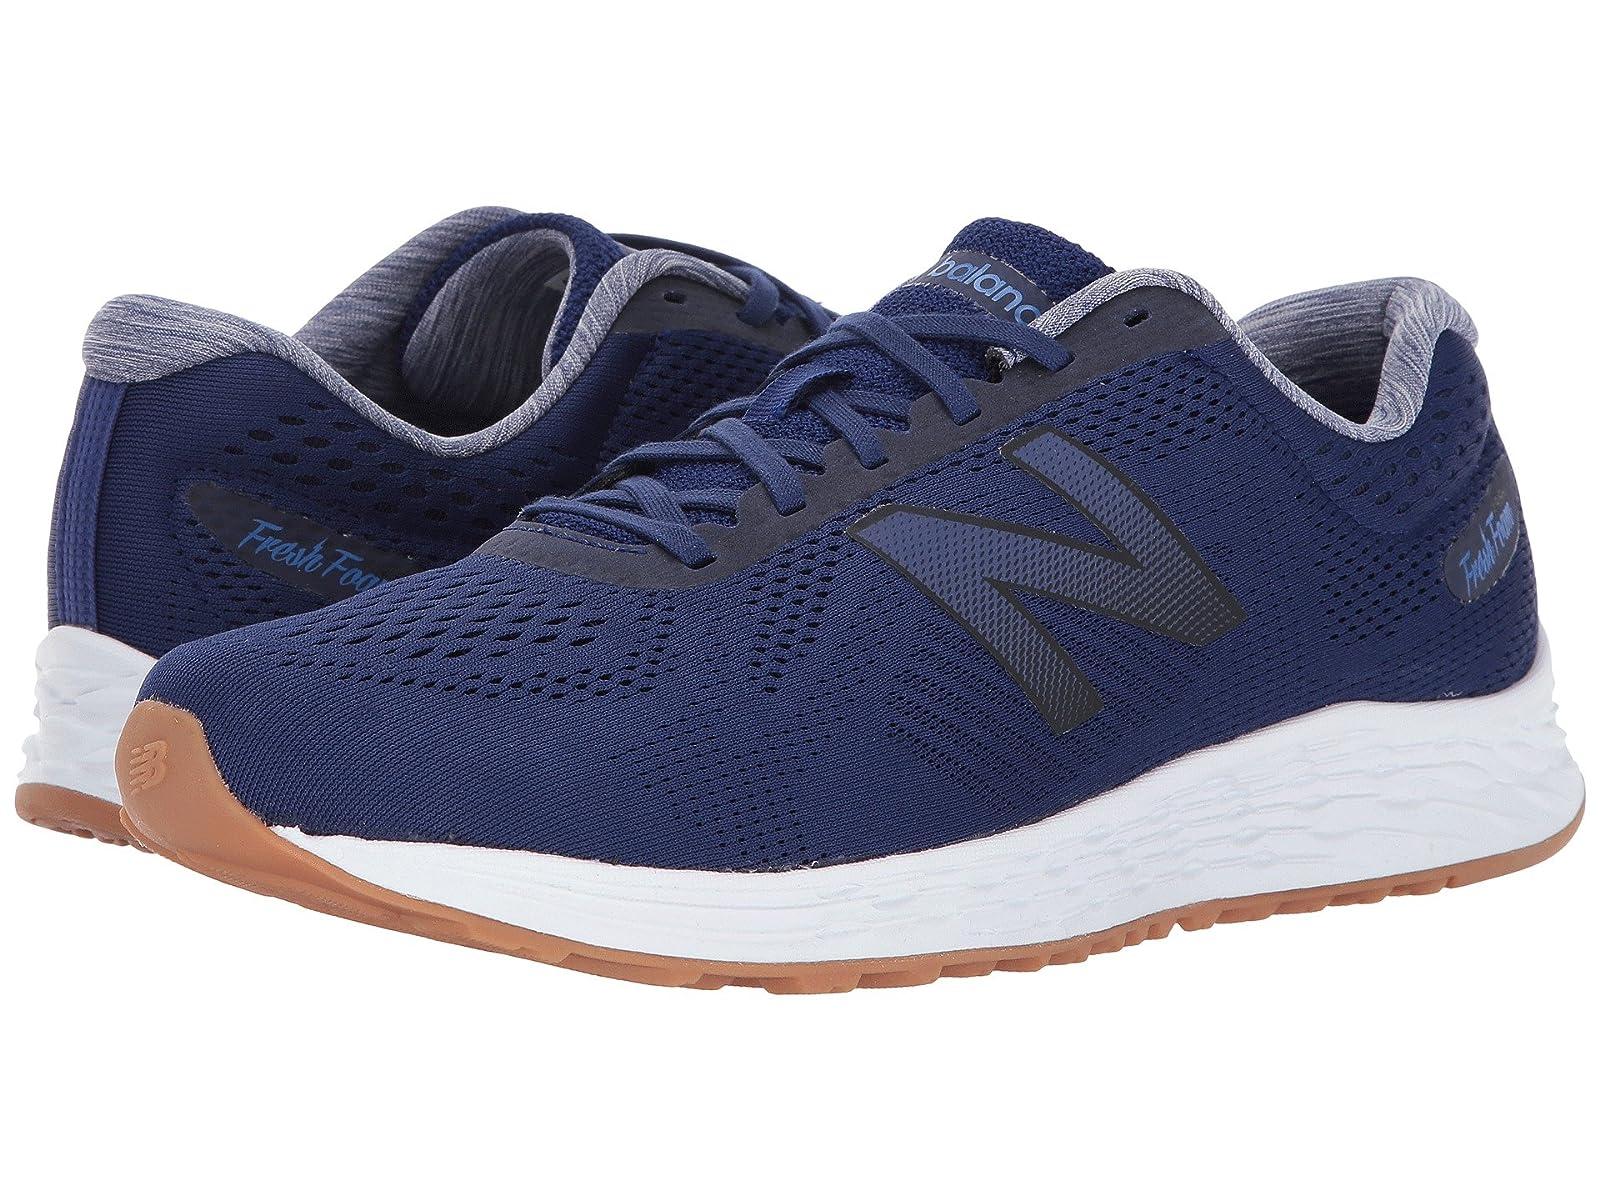 New Balance Arishi v1Atmospheric grades have affordable shoes